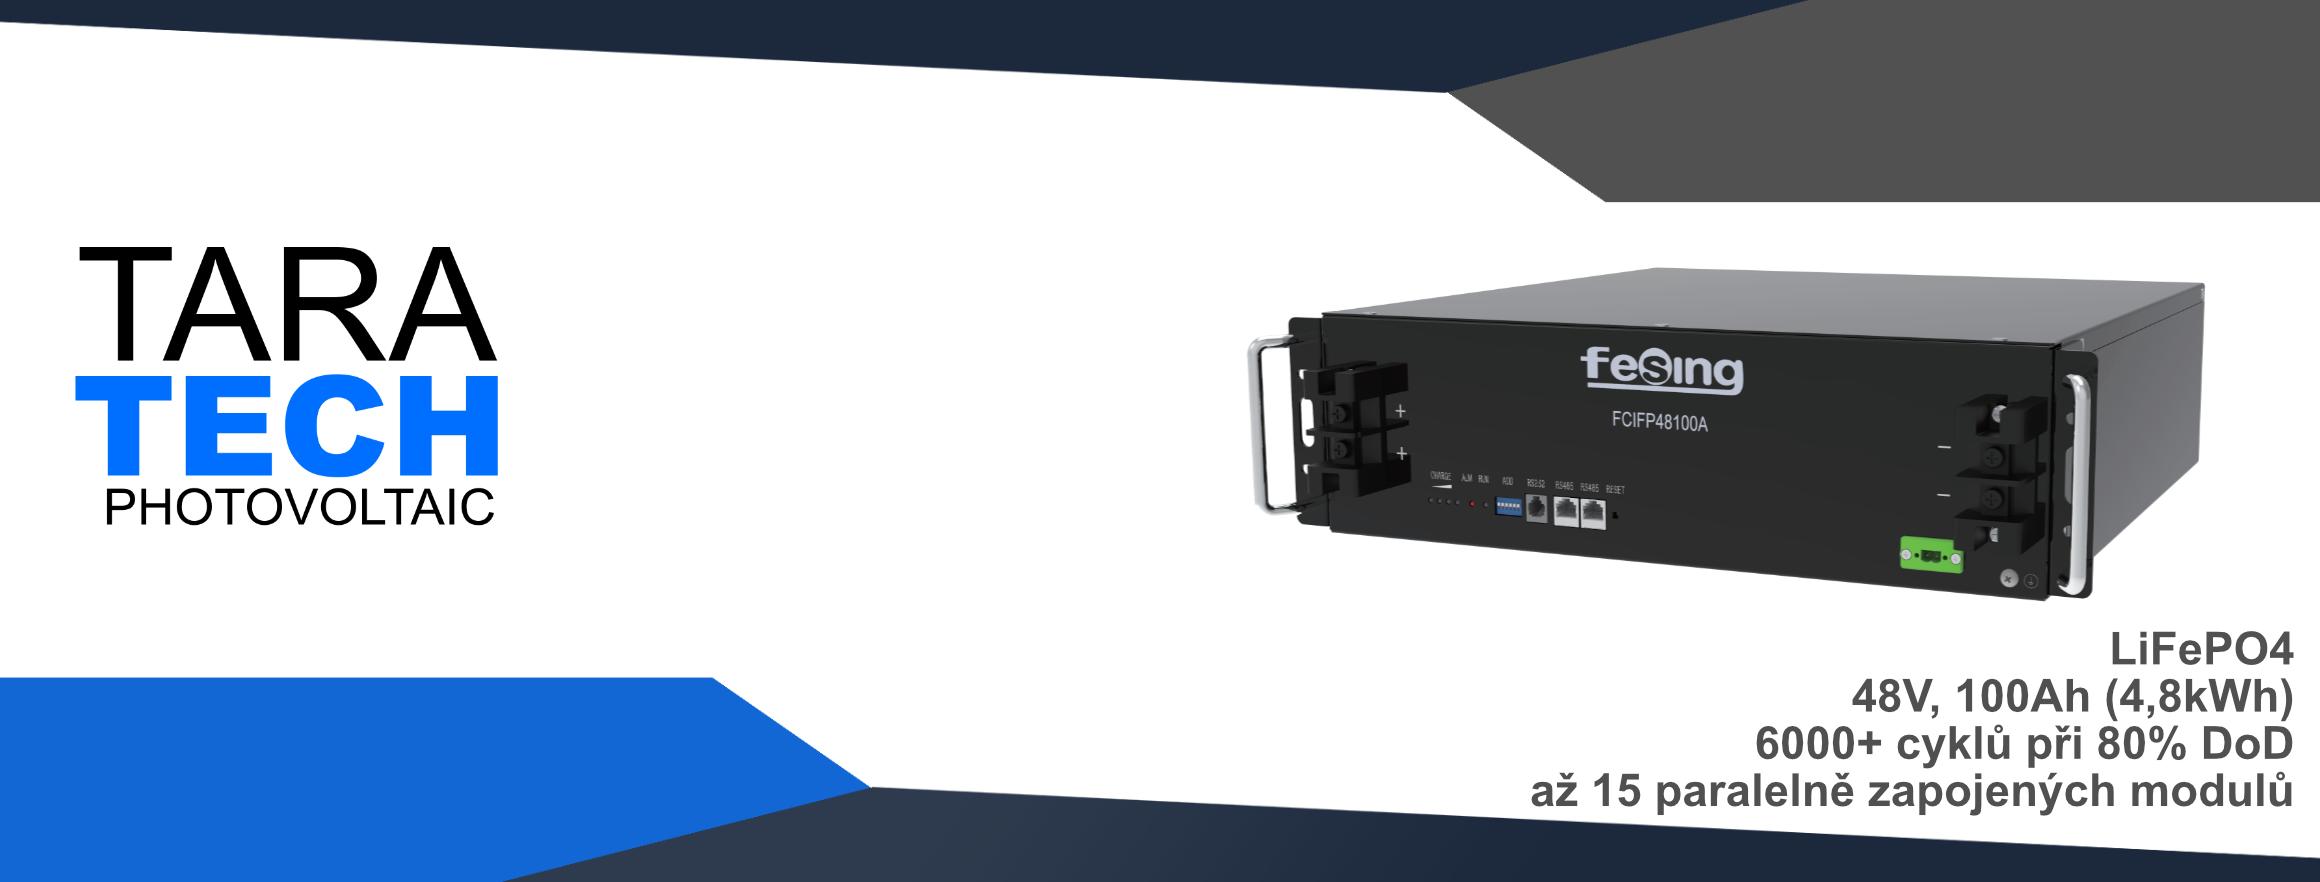 LiFePO4 modul - 48V, 100Ah